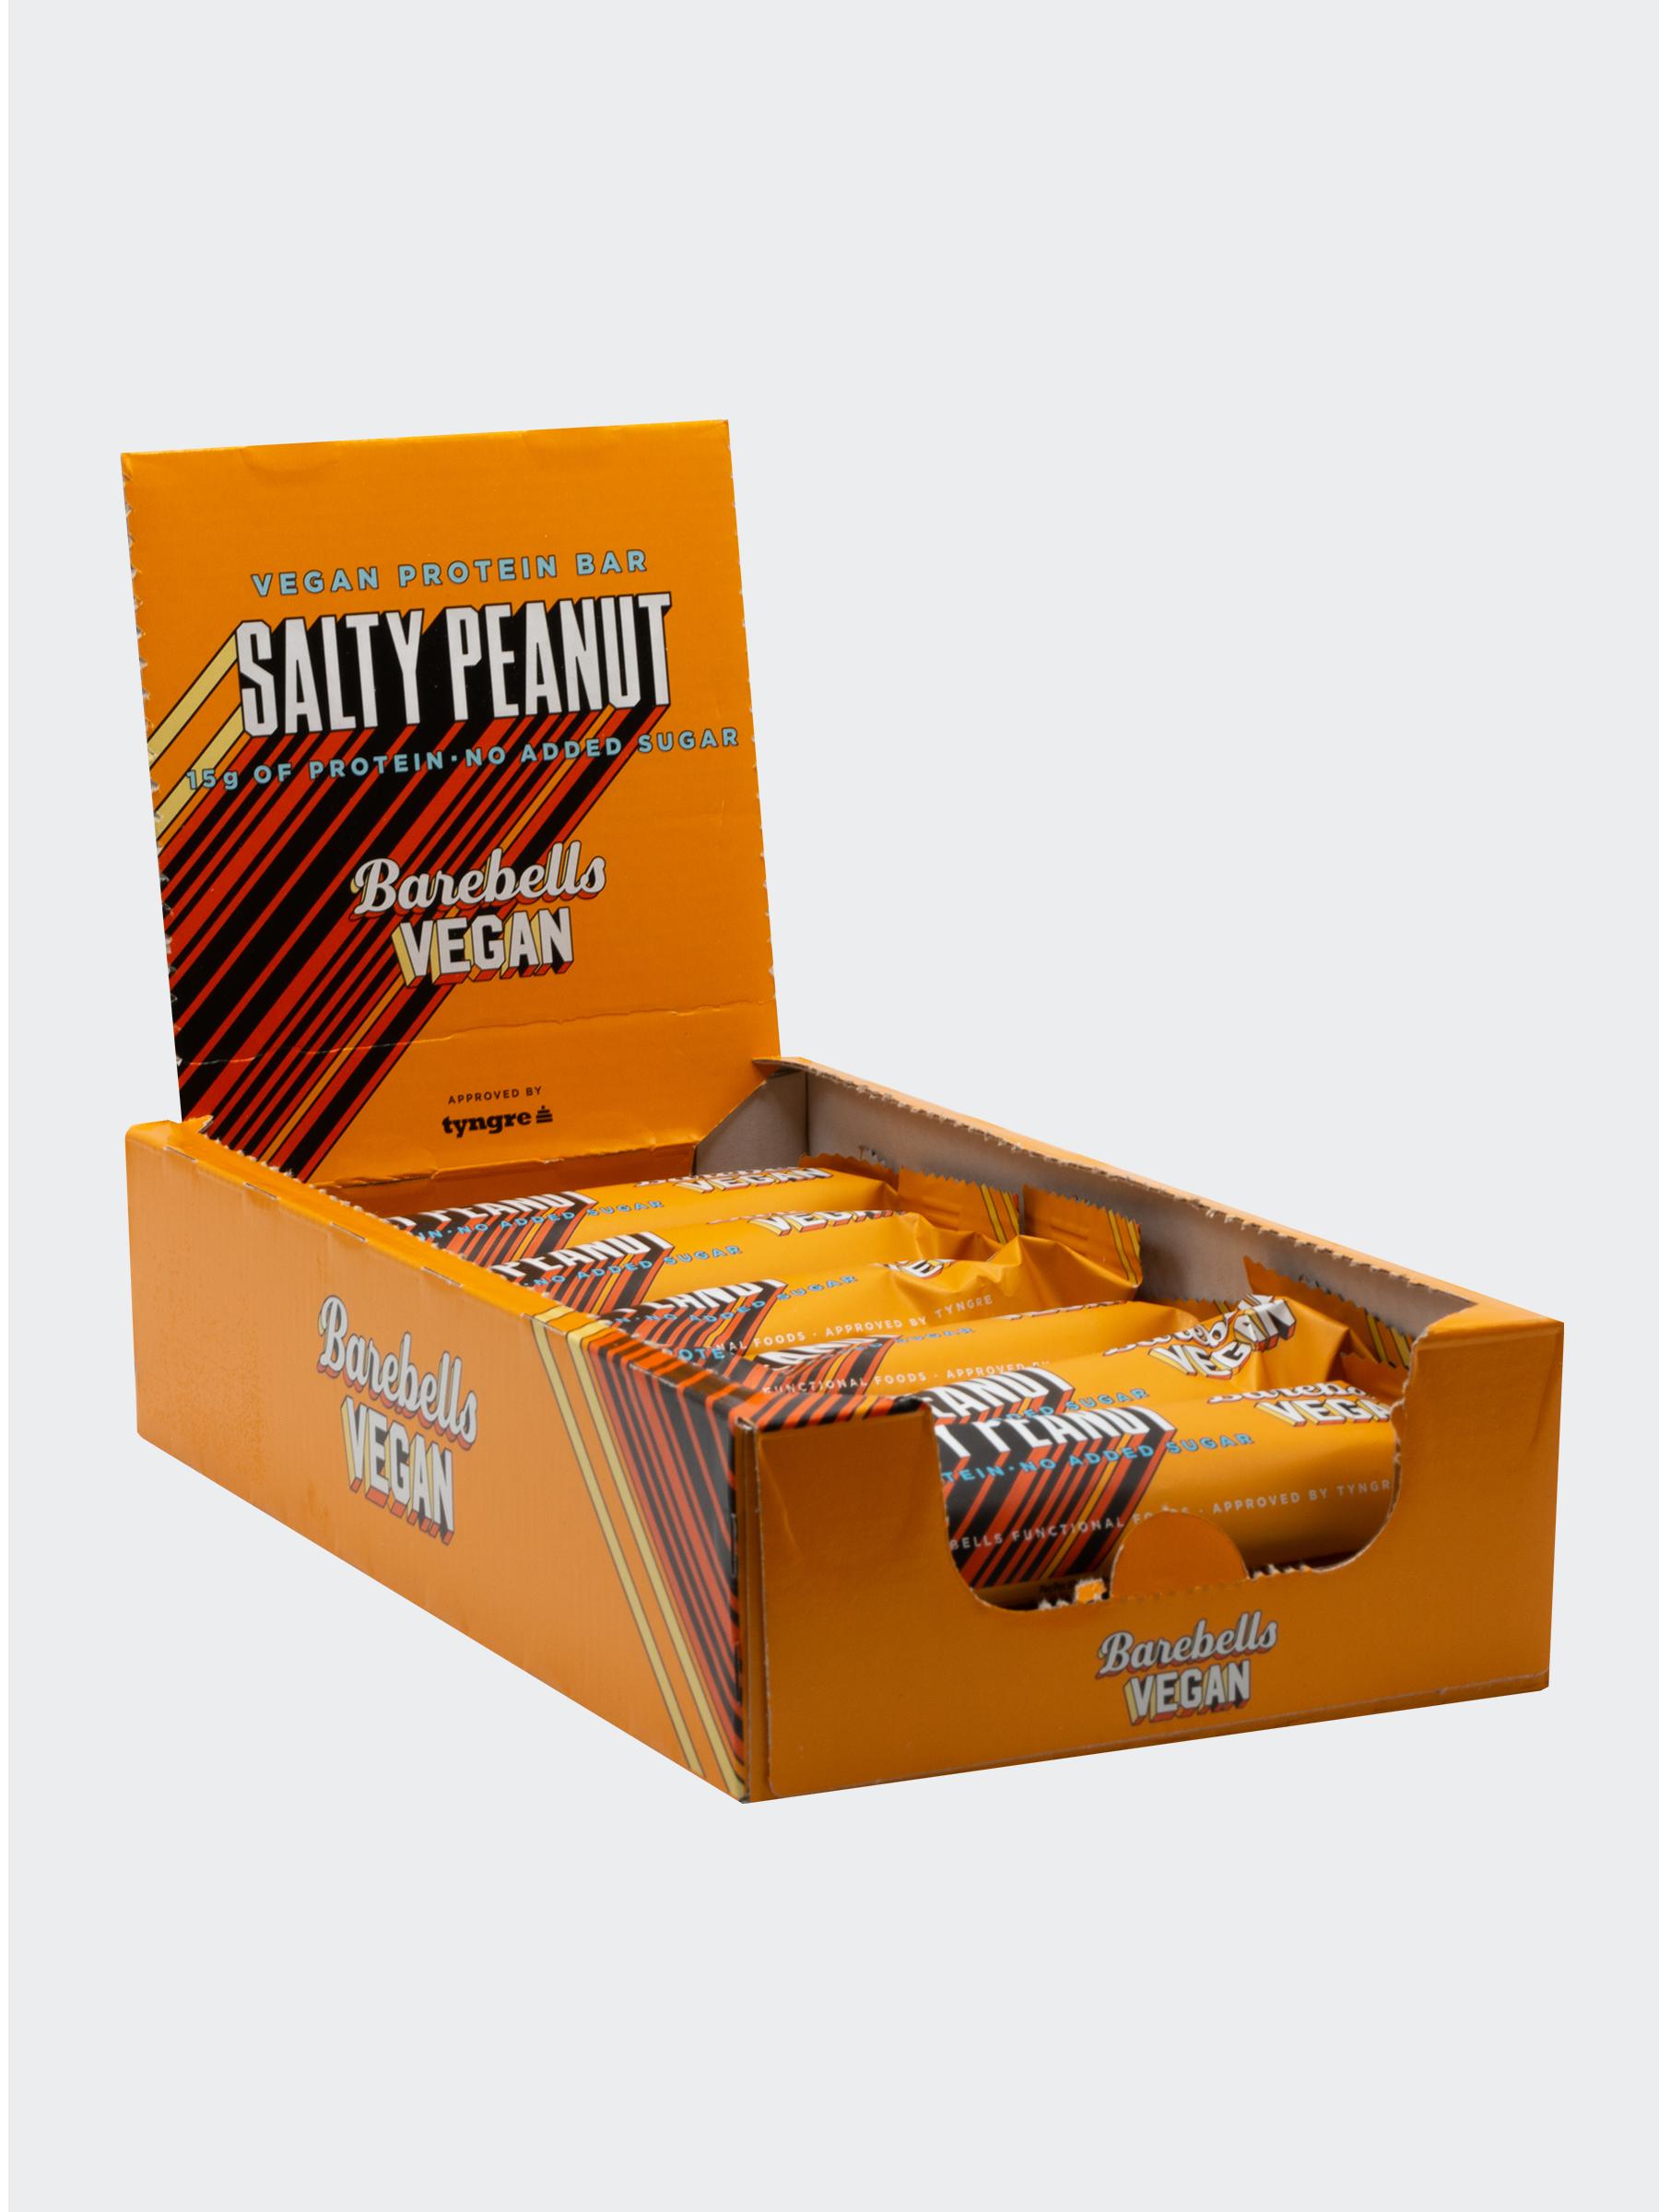 Barebells Vegan Salty Peanut 12-Pack